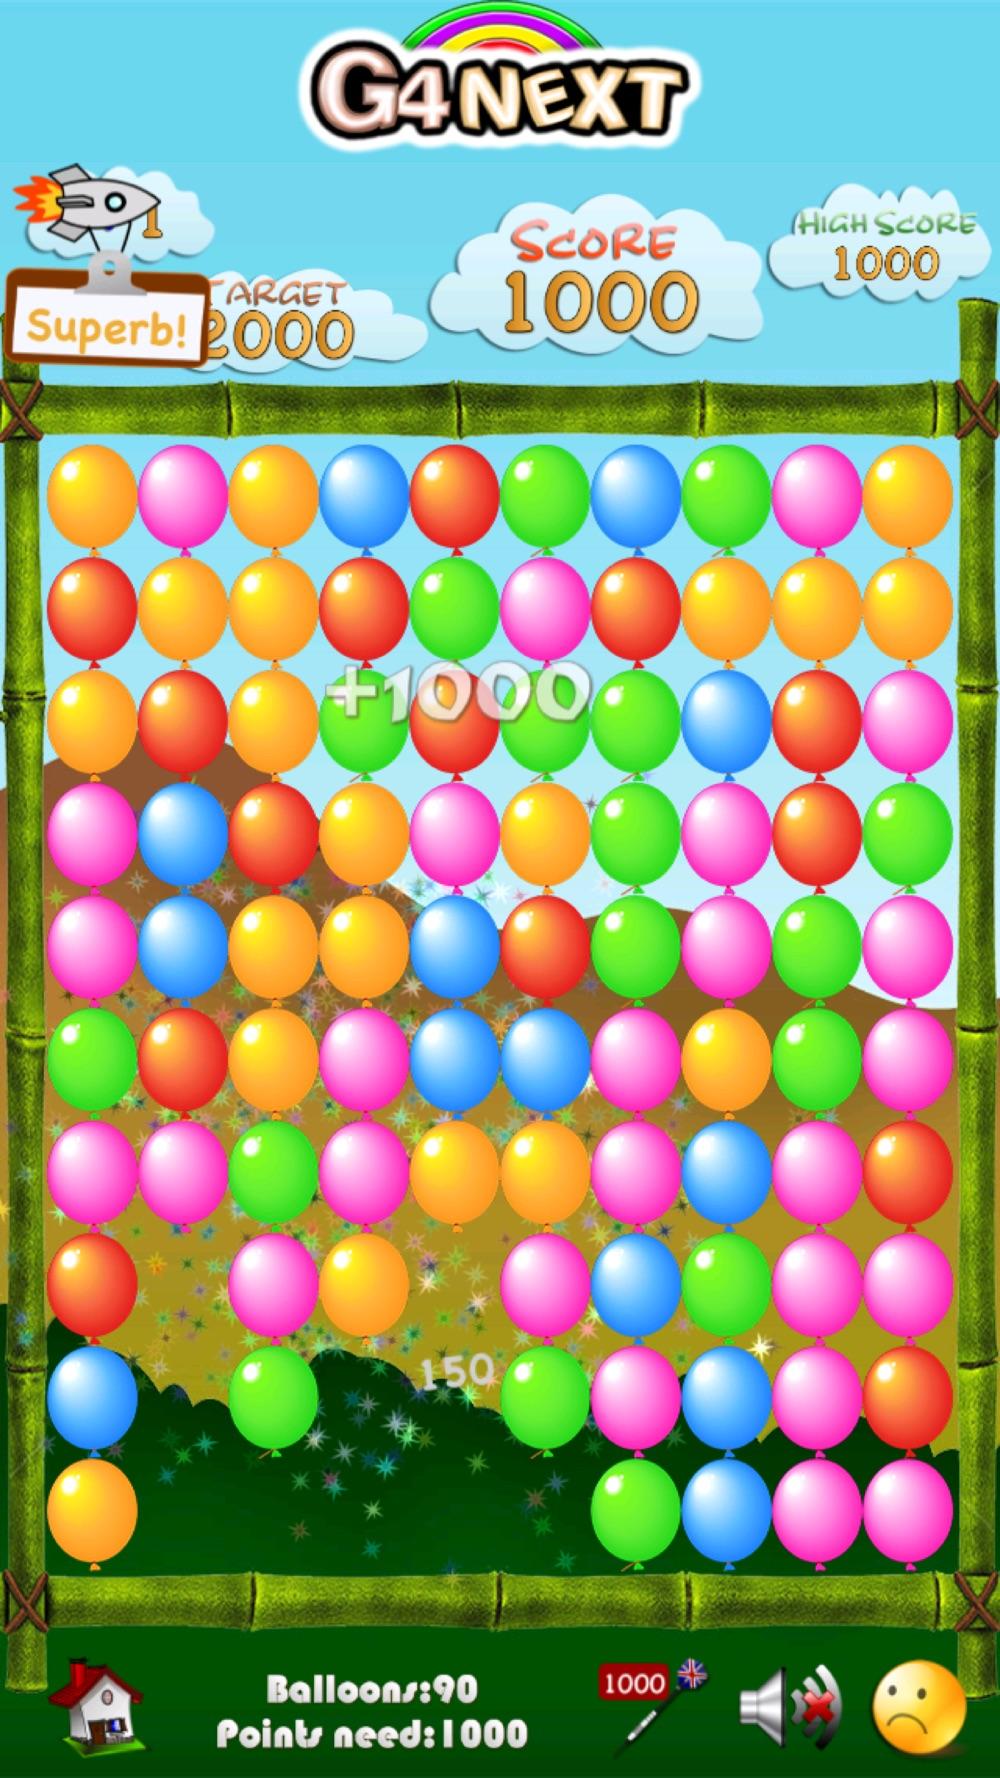 Balloon Crush Cheat Codes